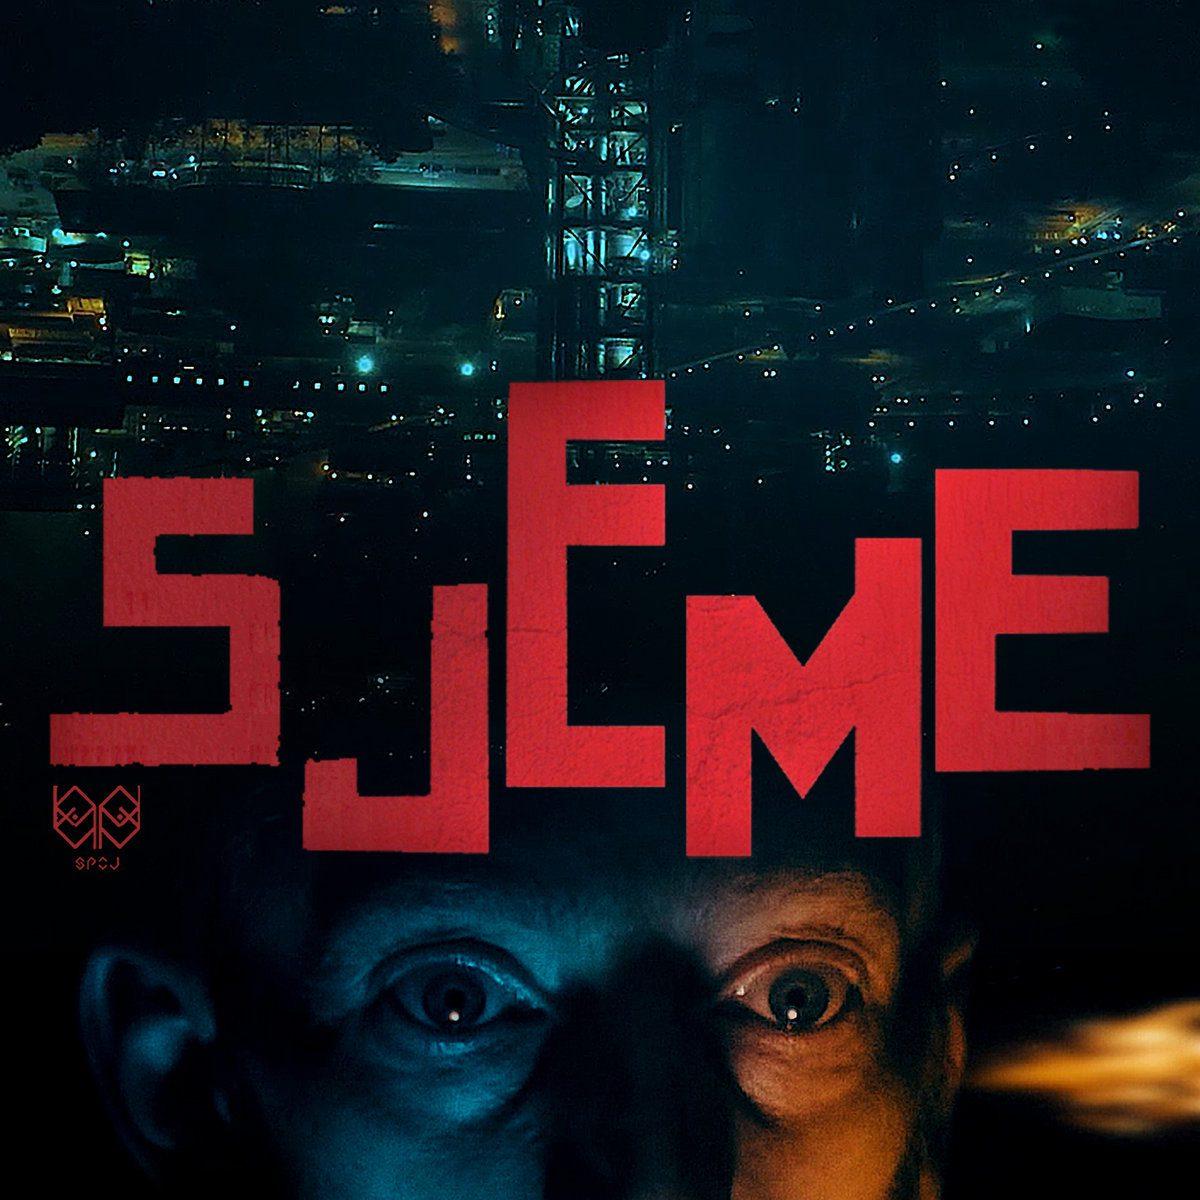 Electro industrial sounds from Lukavac (Bosnia Herzegovina) with S.P.O.J.'s 'Sjeme'